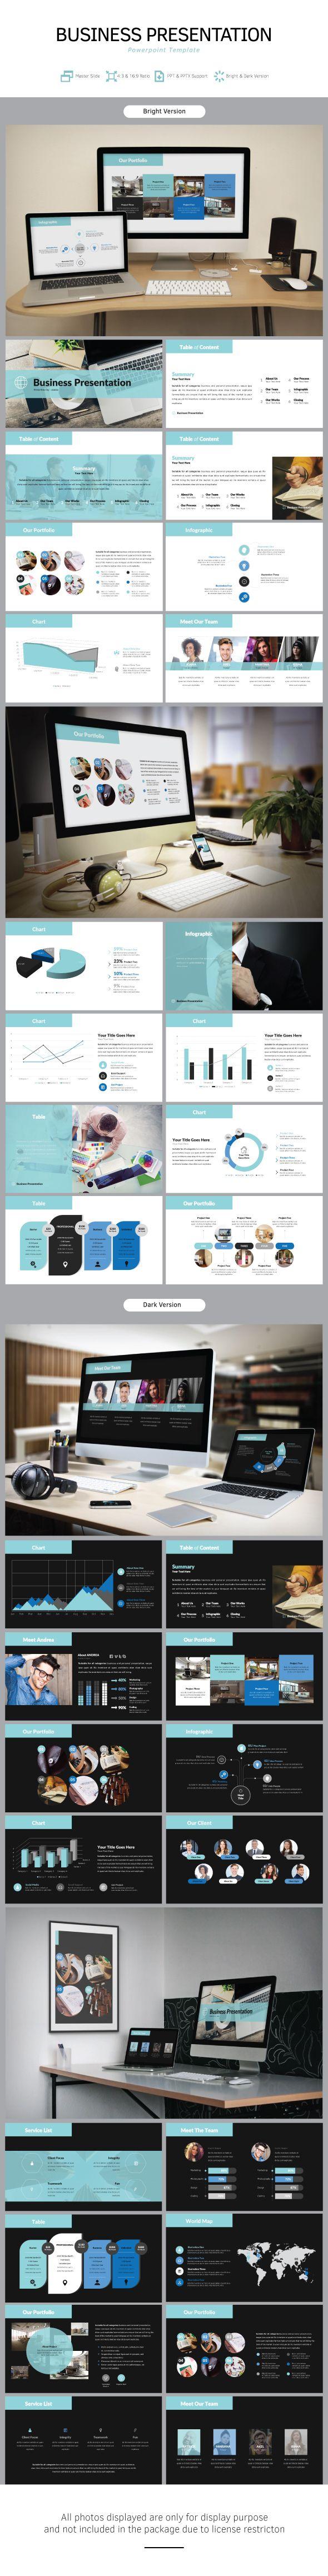 Business Presentation Template - Business PowerPoint Templates